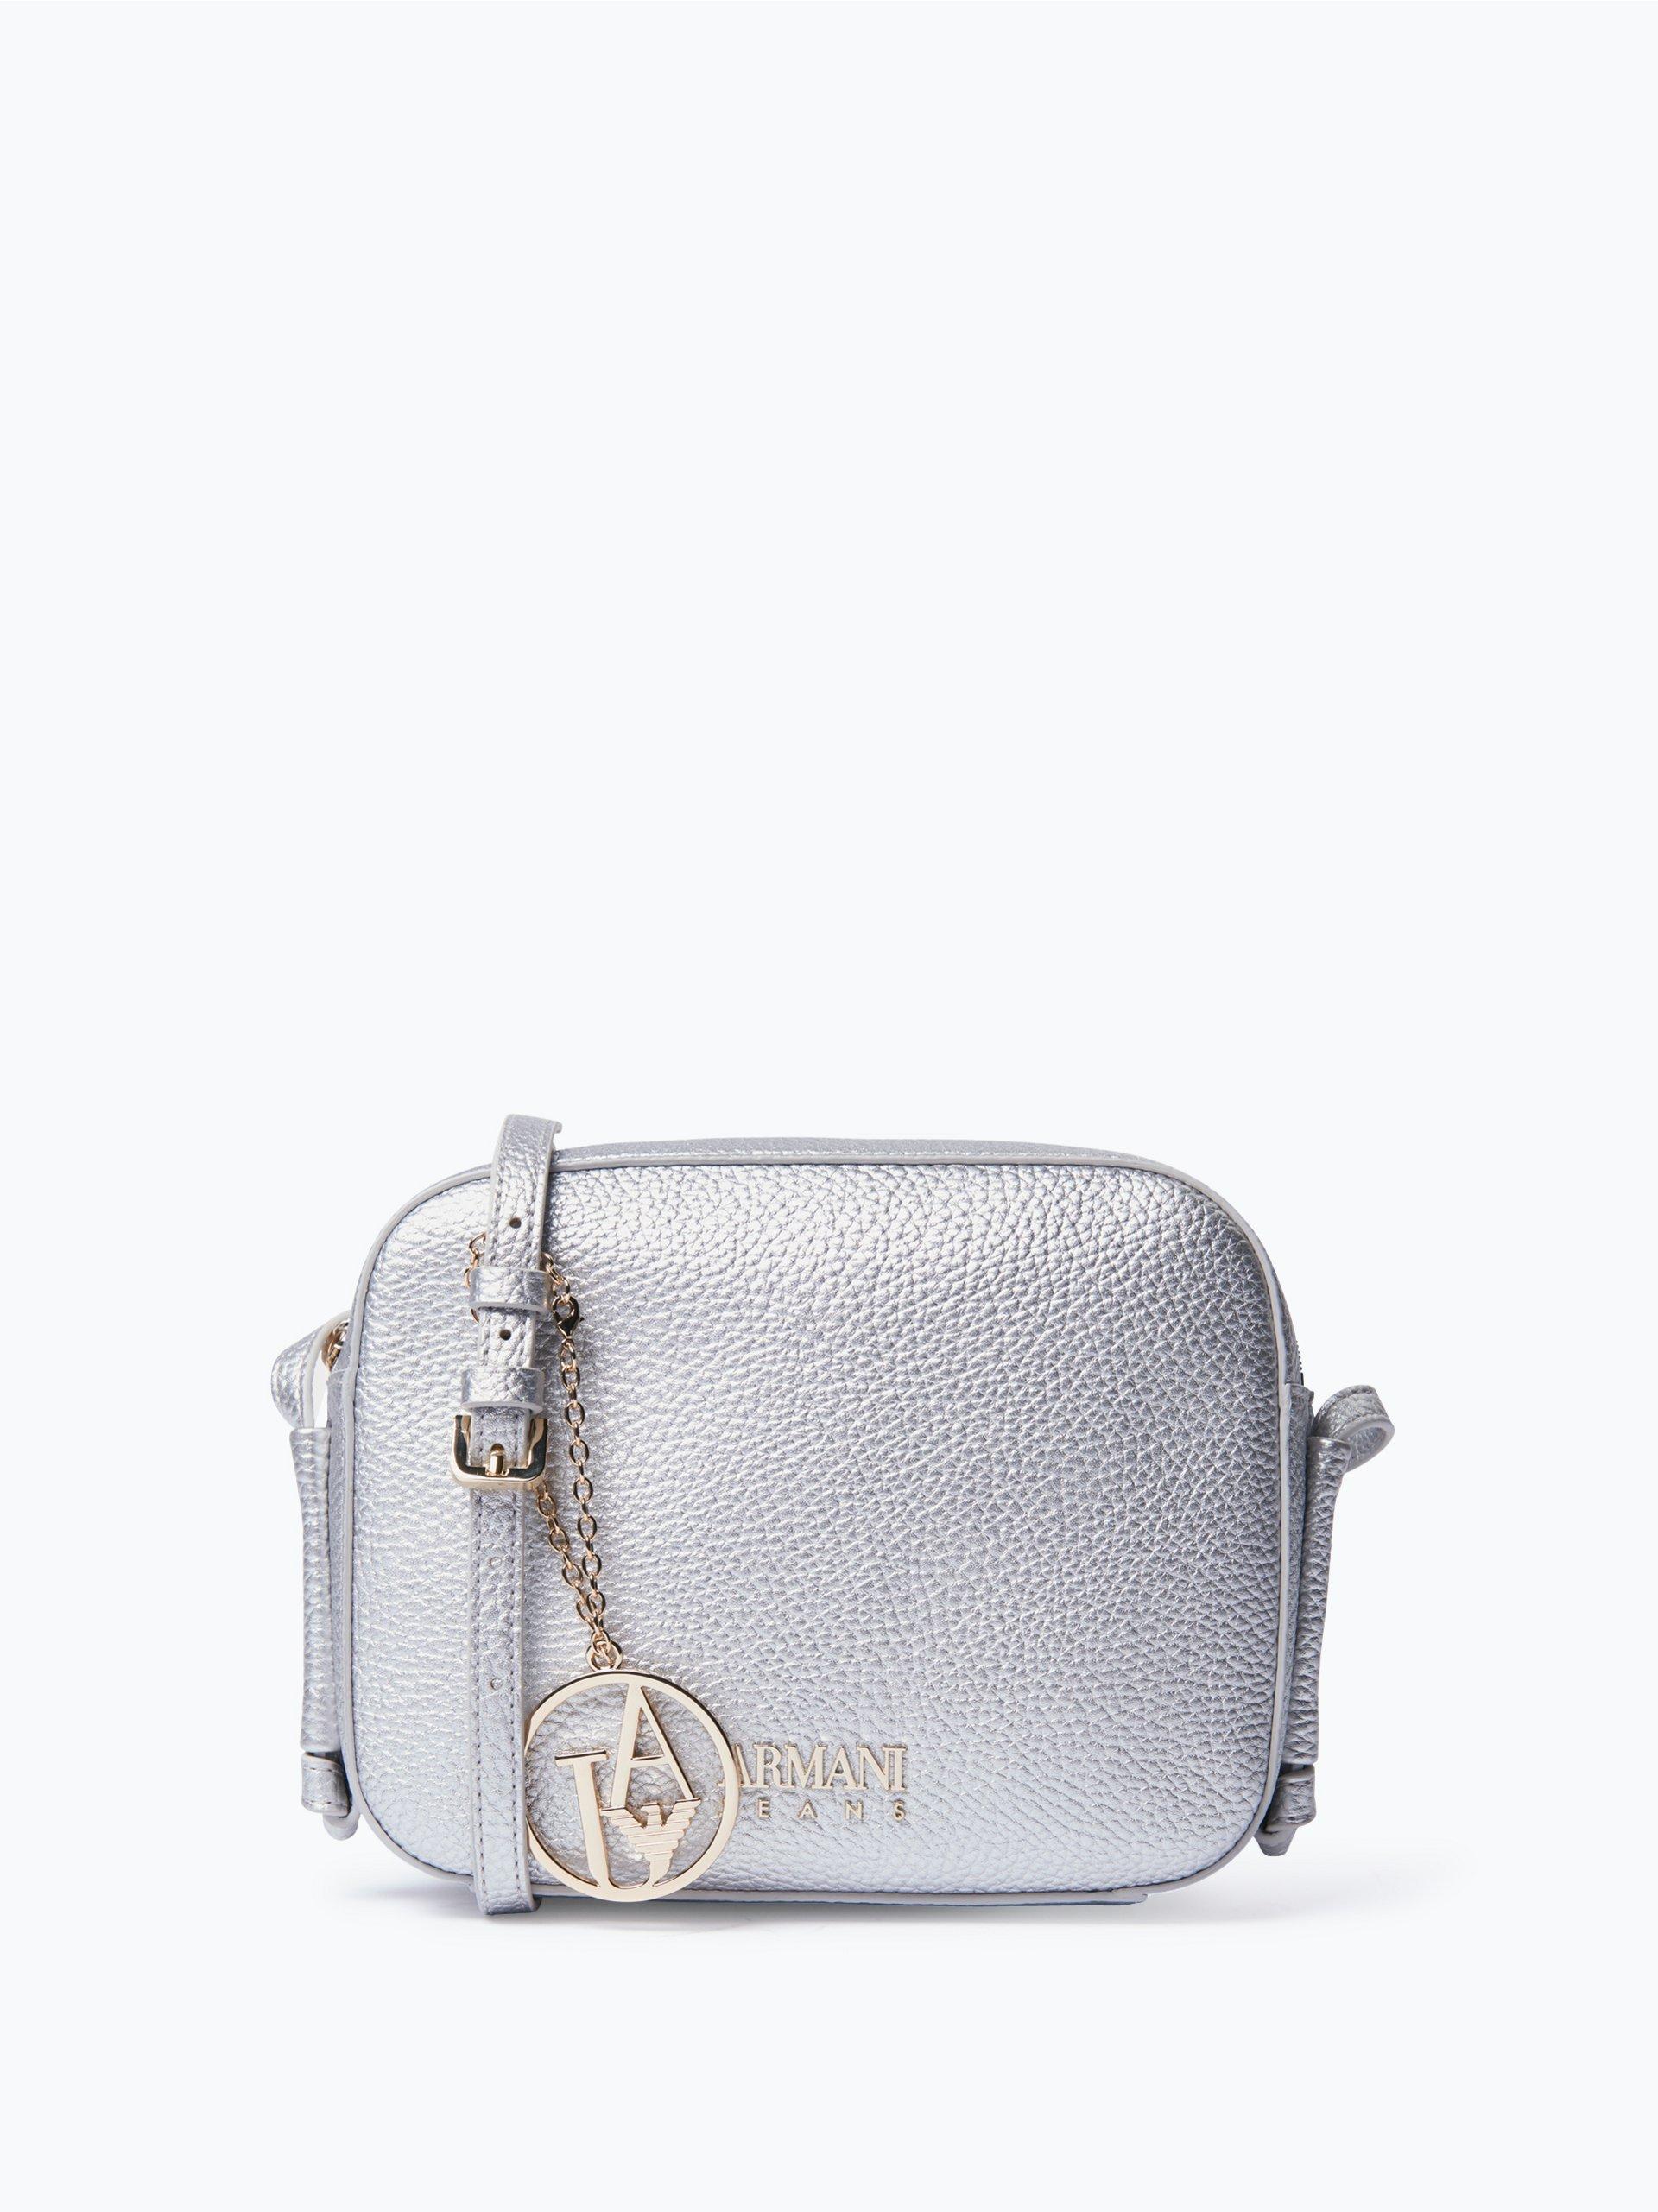 Armani Jeans Damen Handtasche